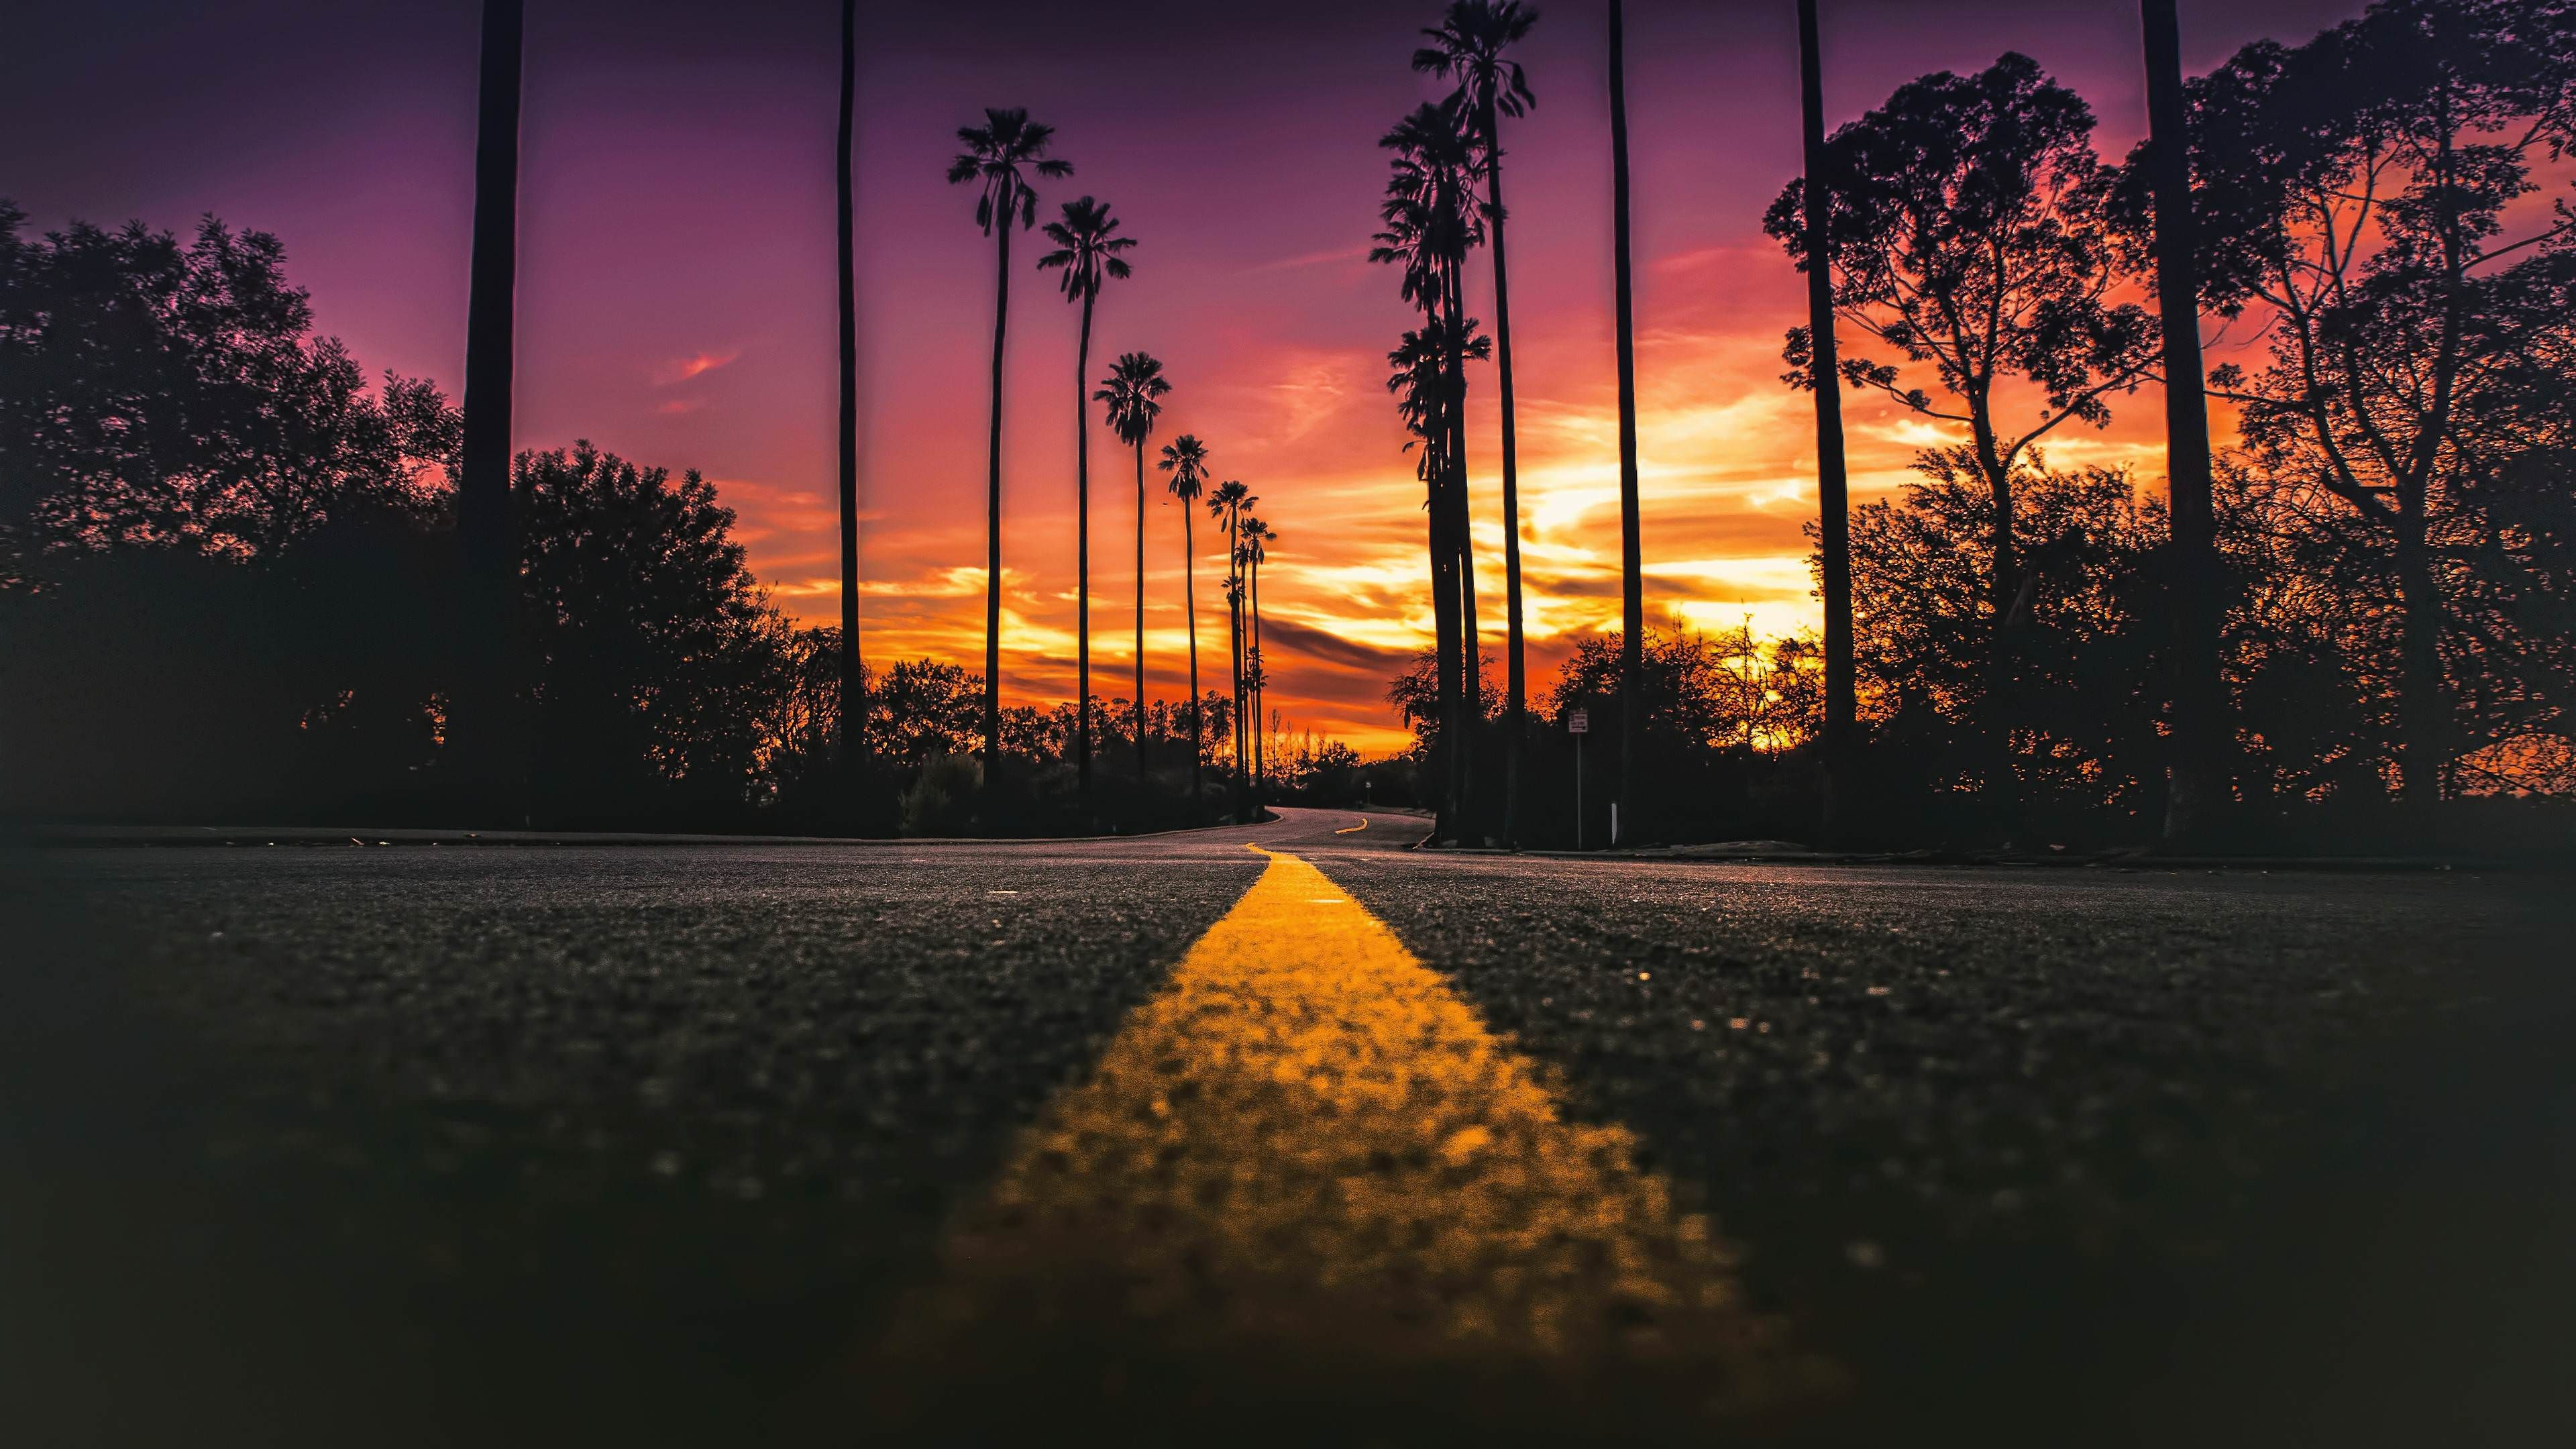 Street Of Los Angeles 3840x2160 Sunset Wallpaper California Wallpaper Sunset